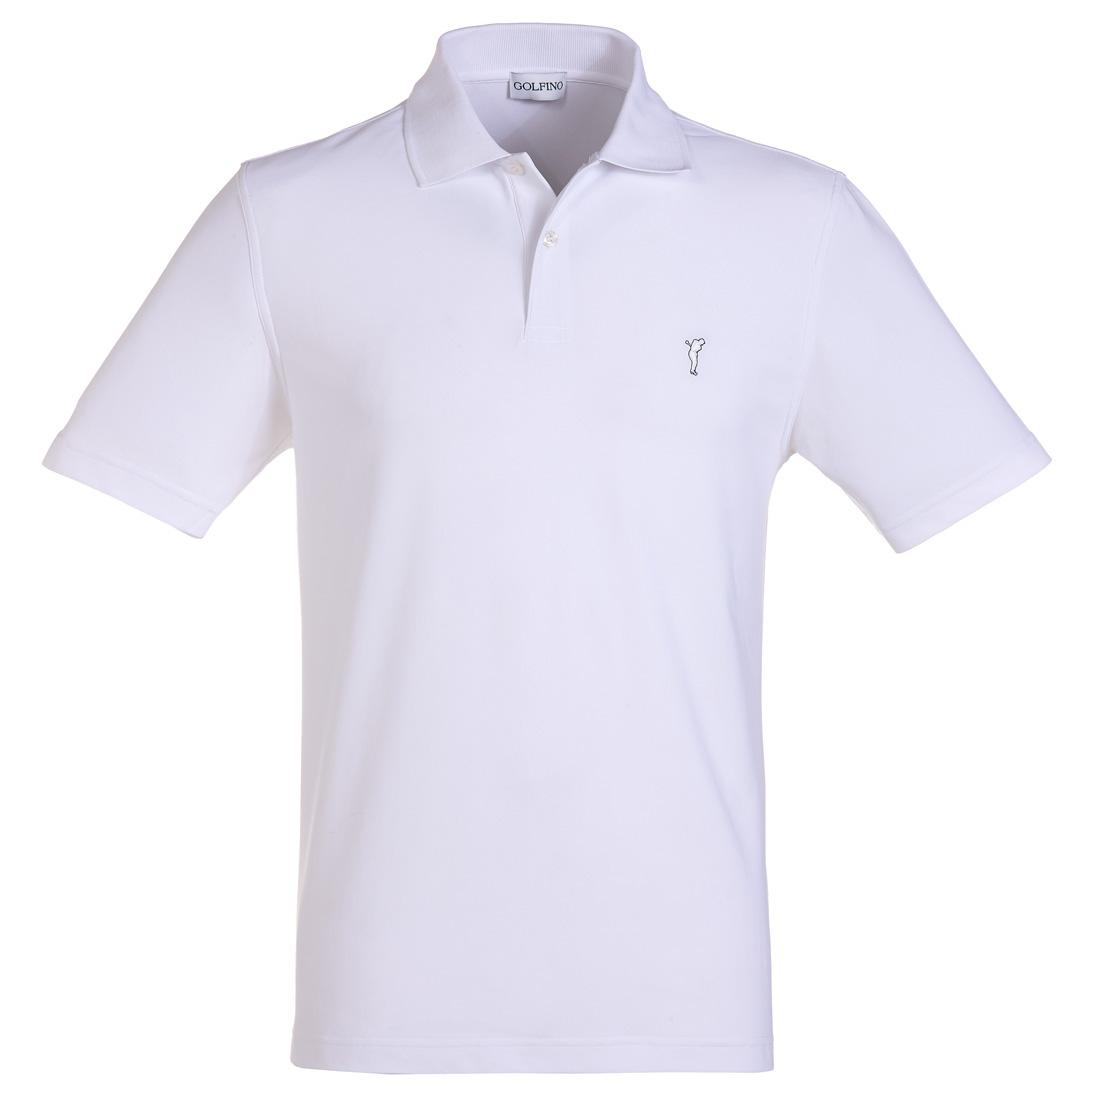 Extra Dry Kurzarm Golf Poloshirt Weiß